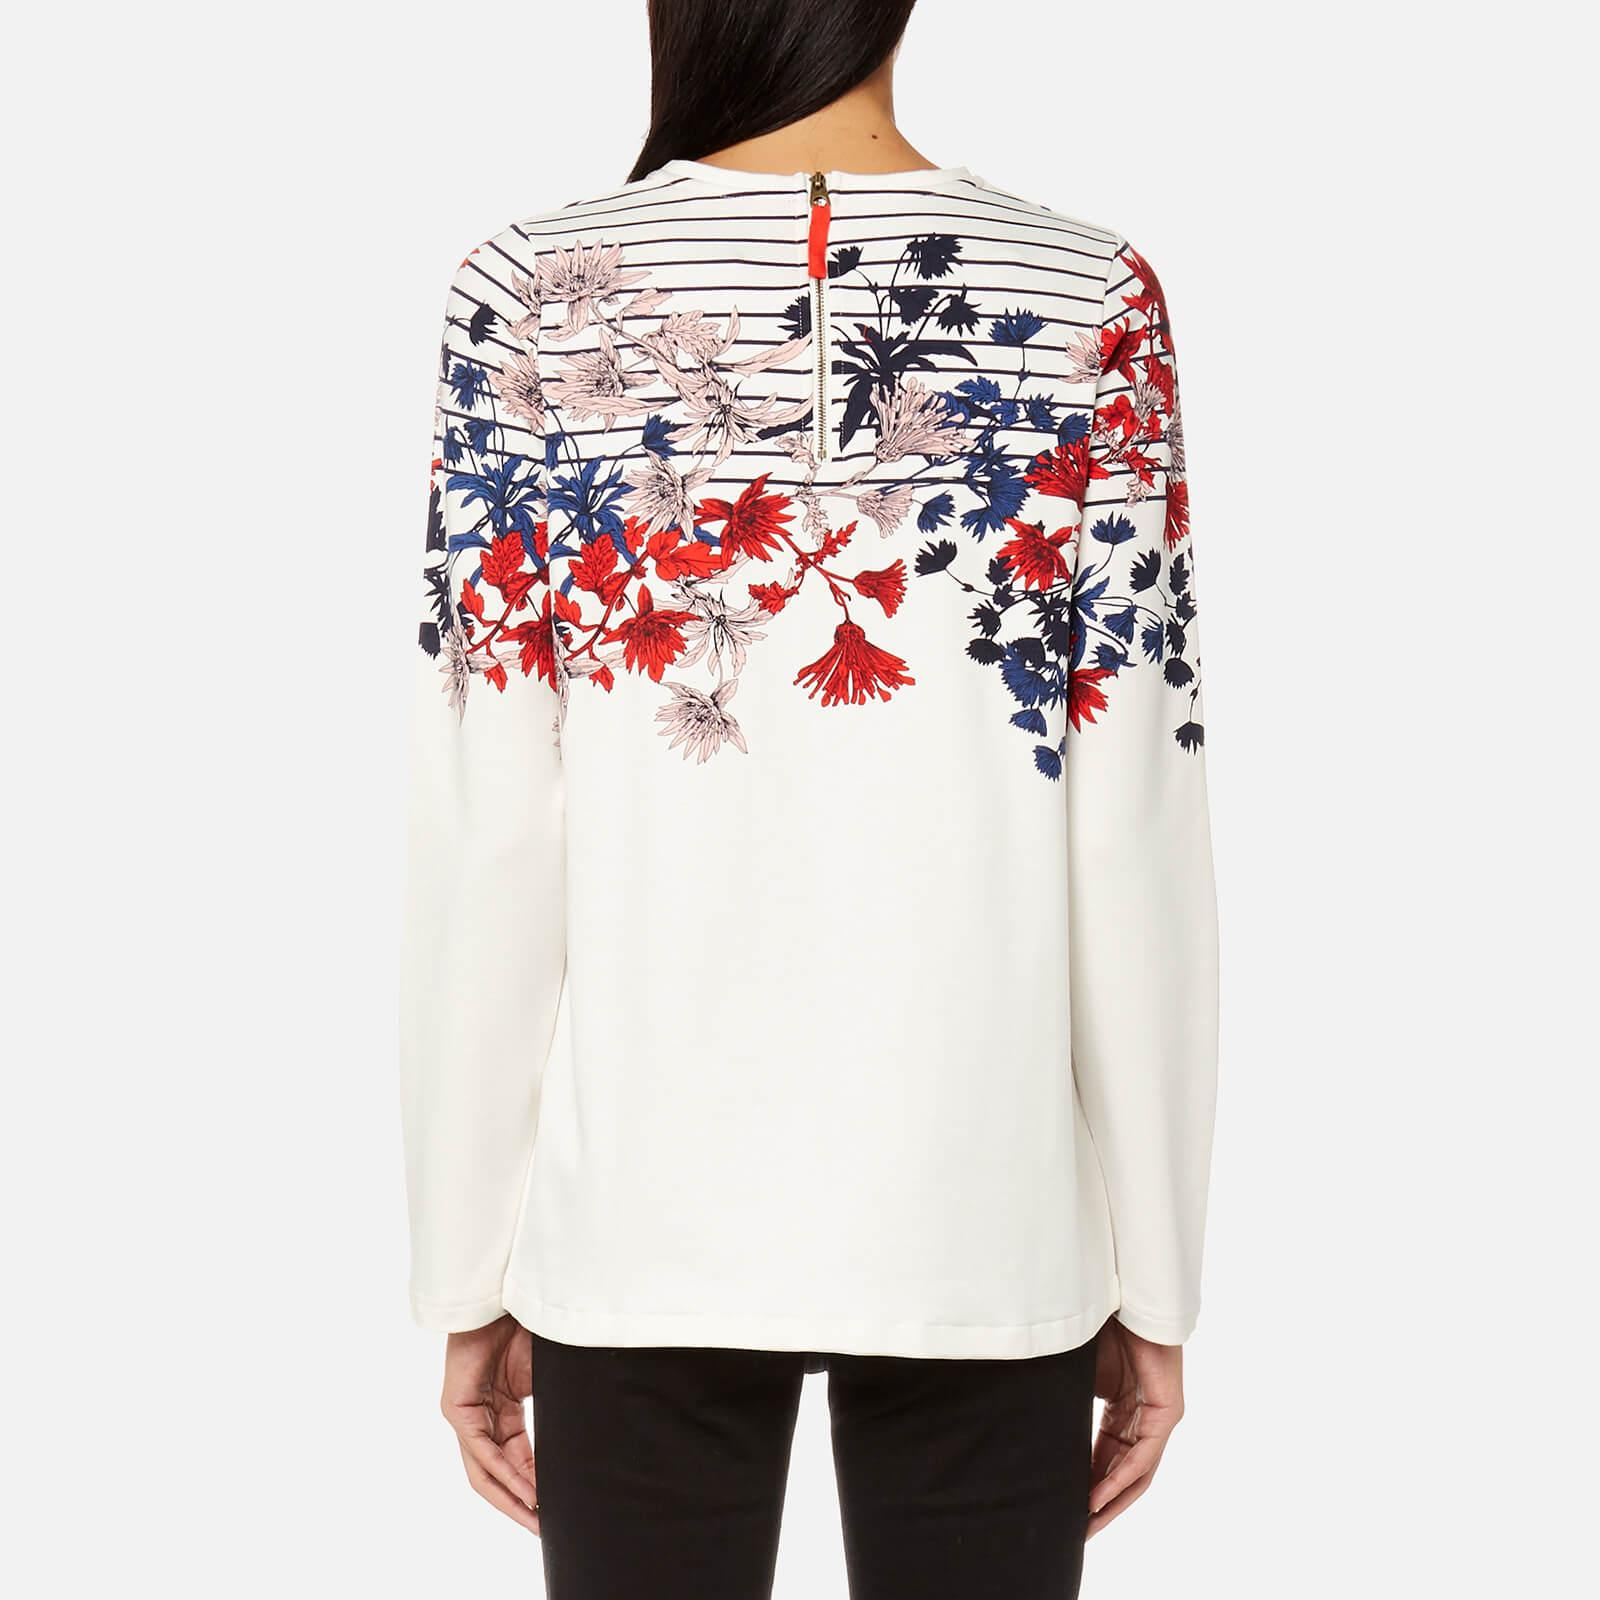 Joules Cotton Clemence Printed Crew Neck Sweatshirt